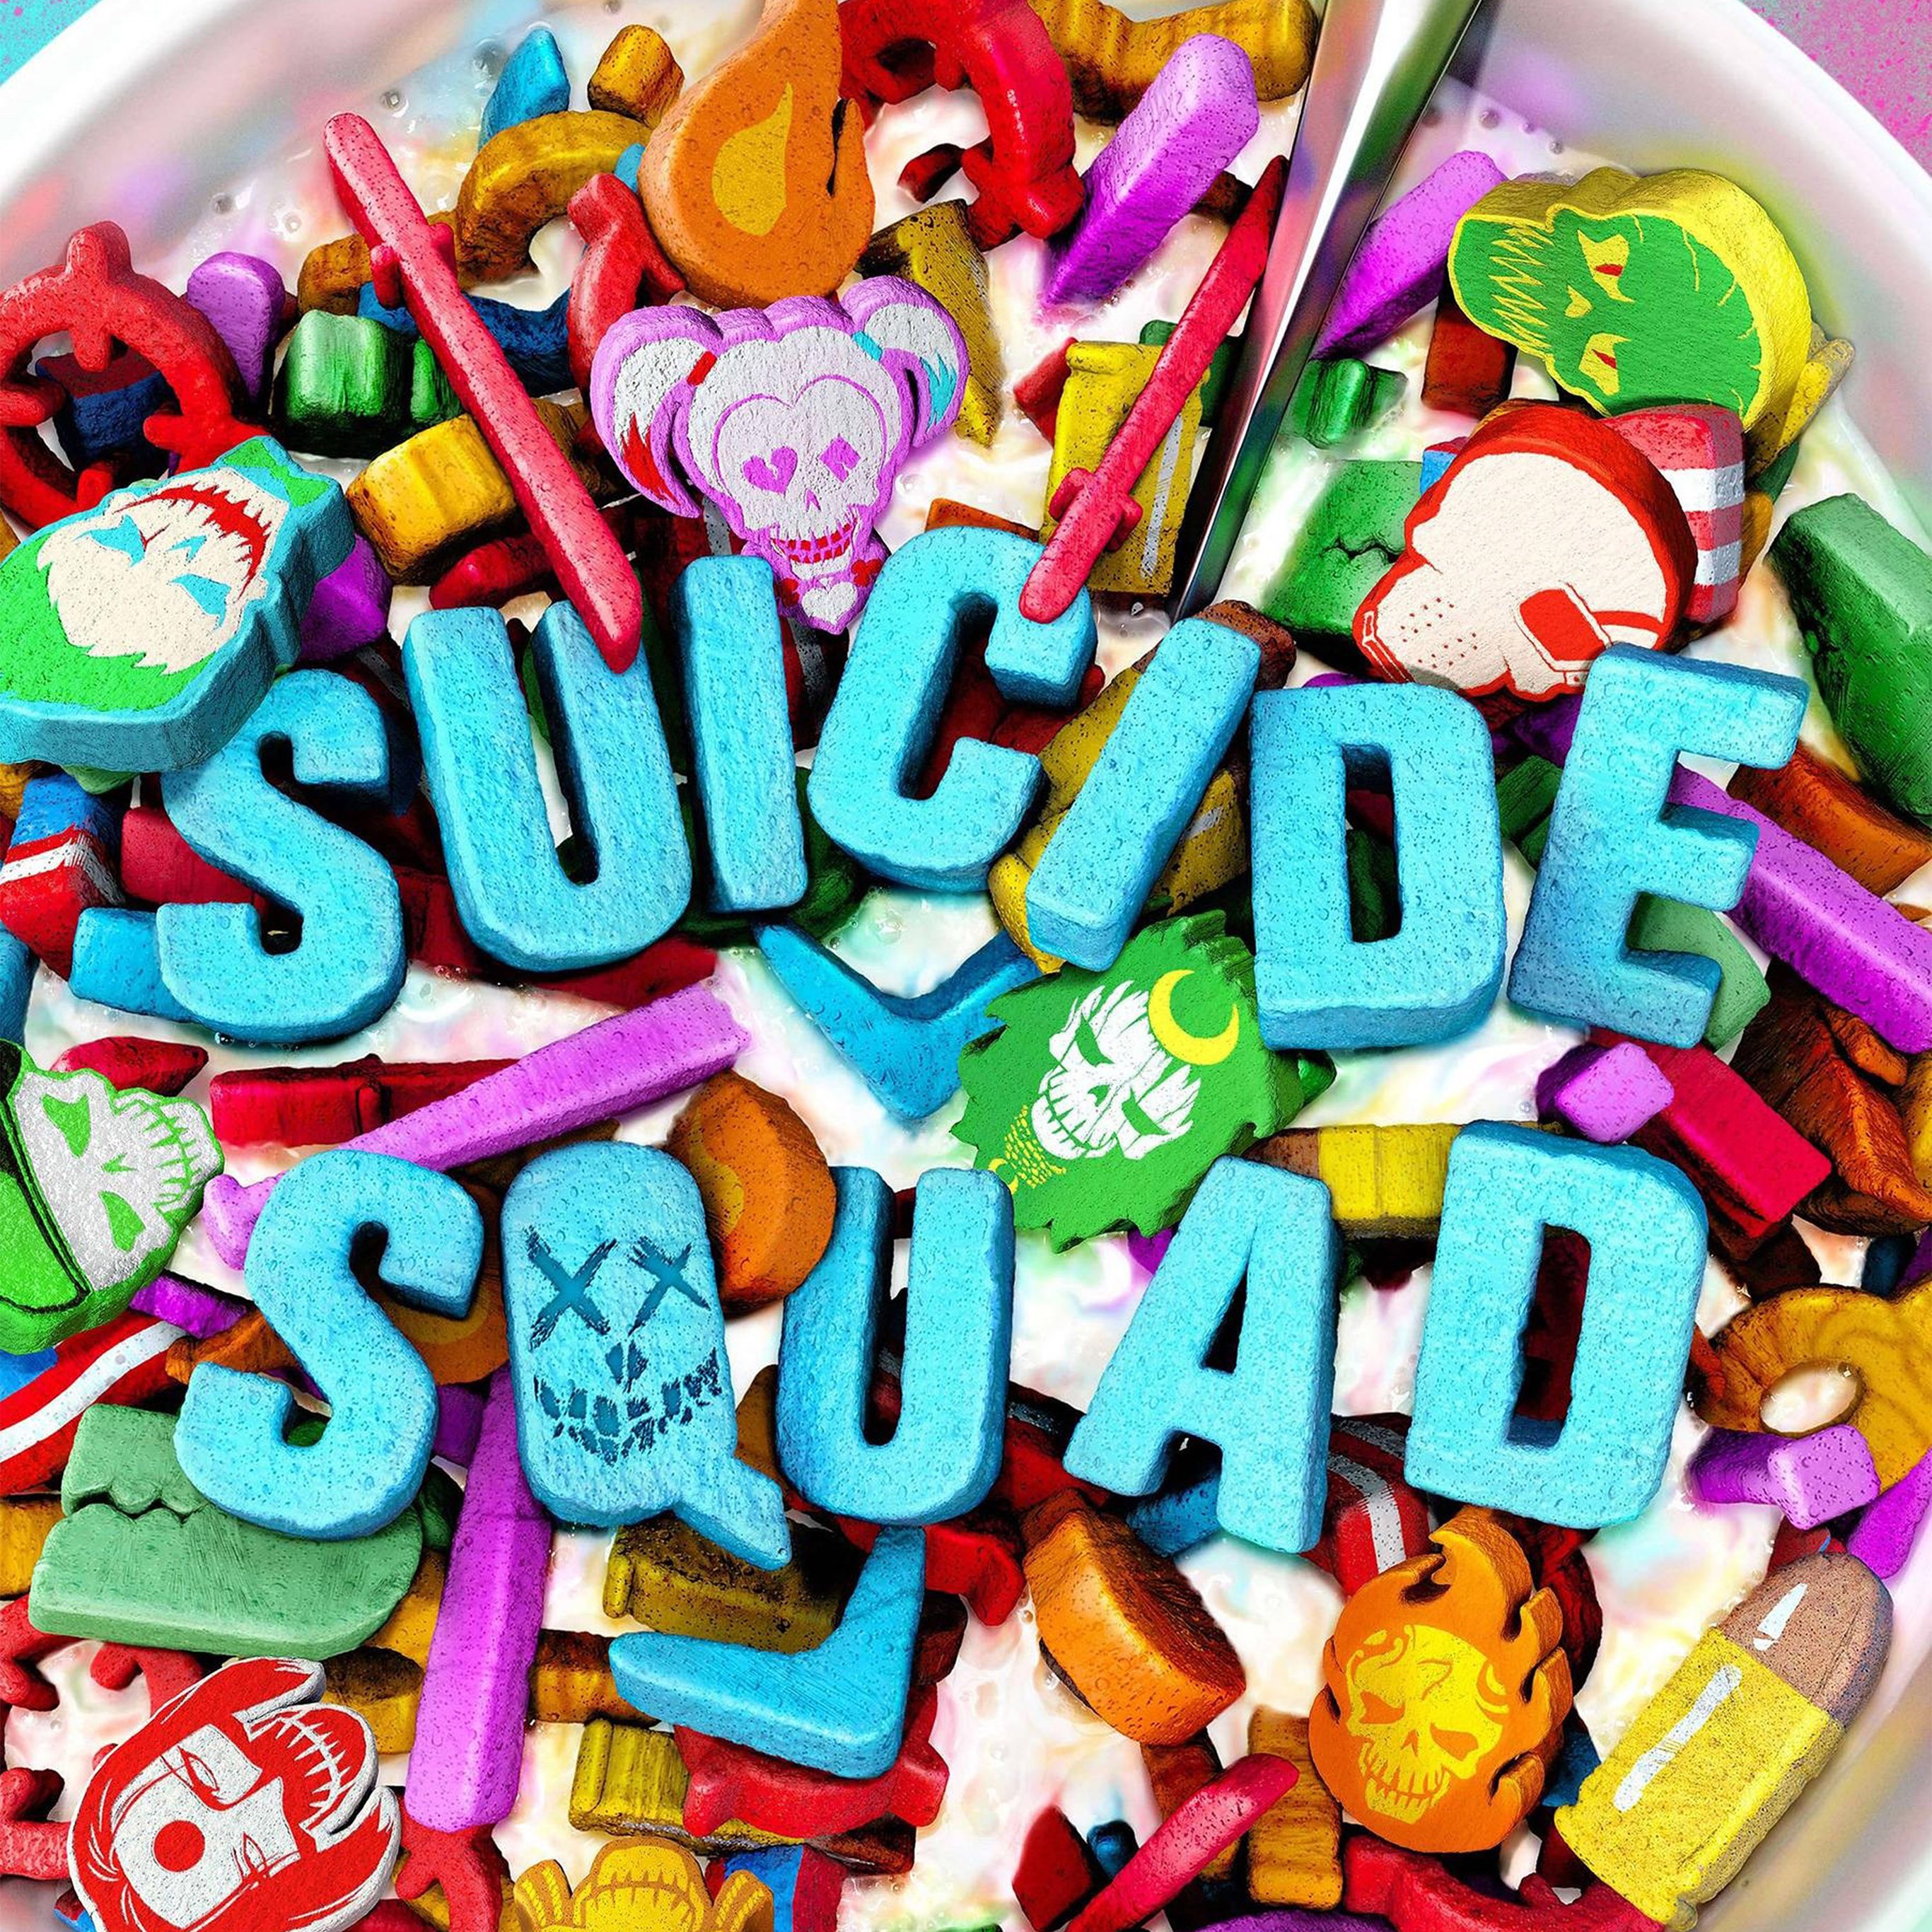 As55 Suicide Squad Corn Meal Food Art Illustration Wallpaper